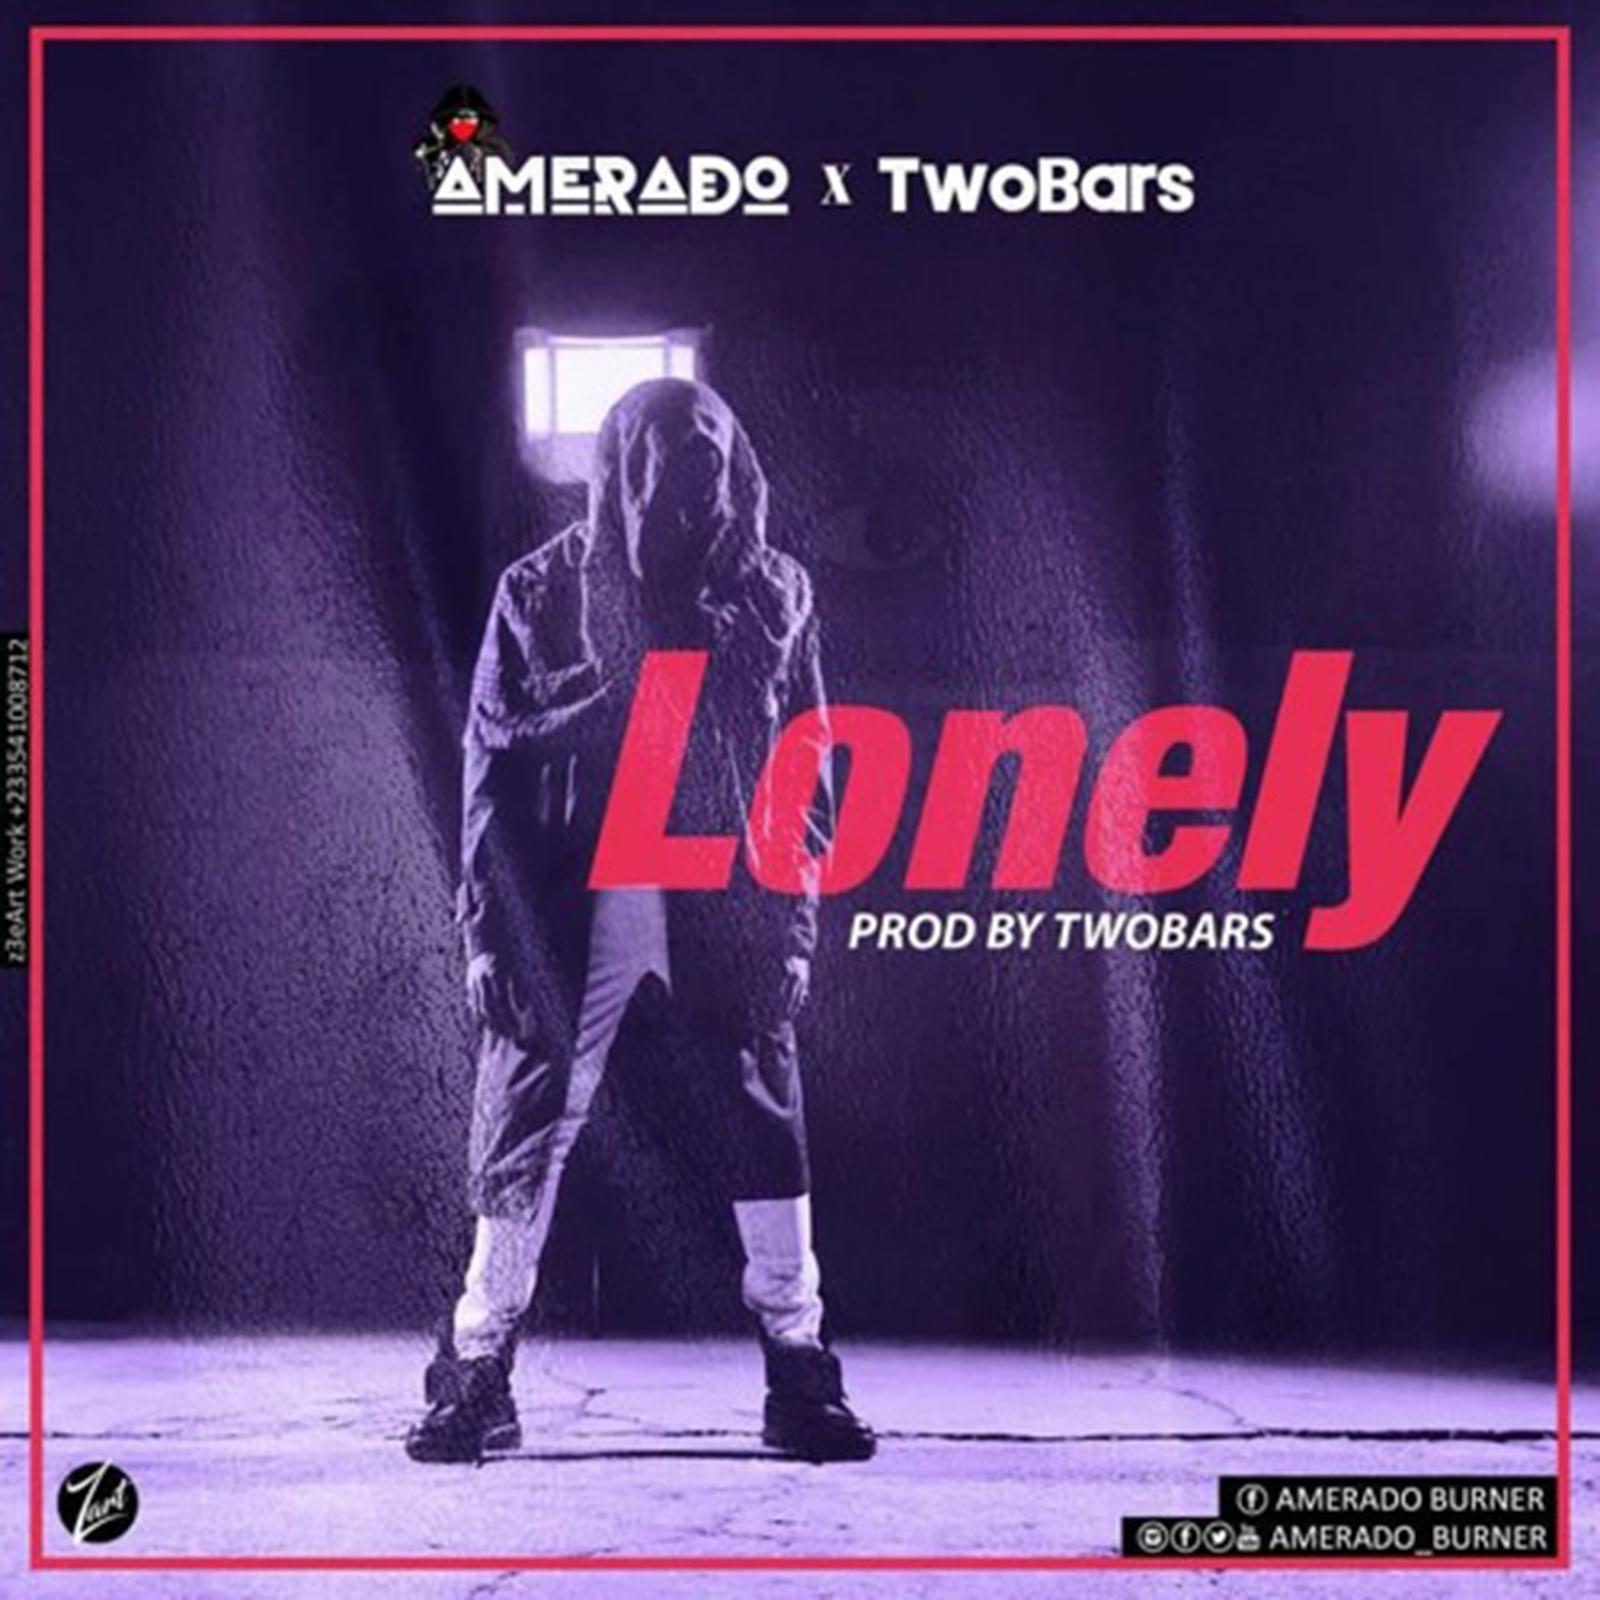 Lonely by Amerado & TwoBars